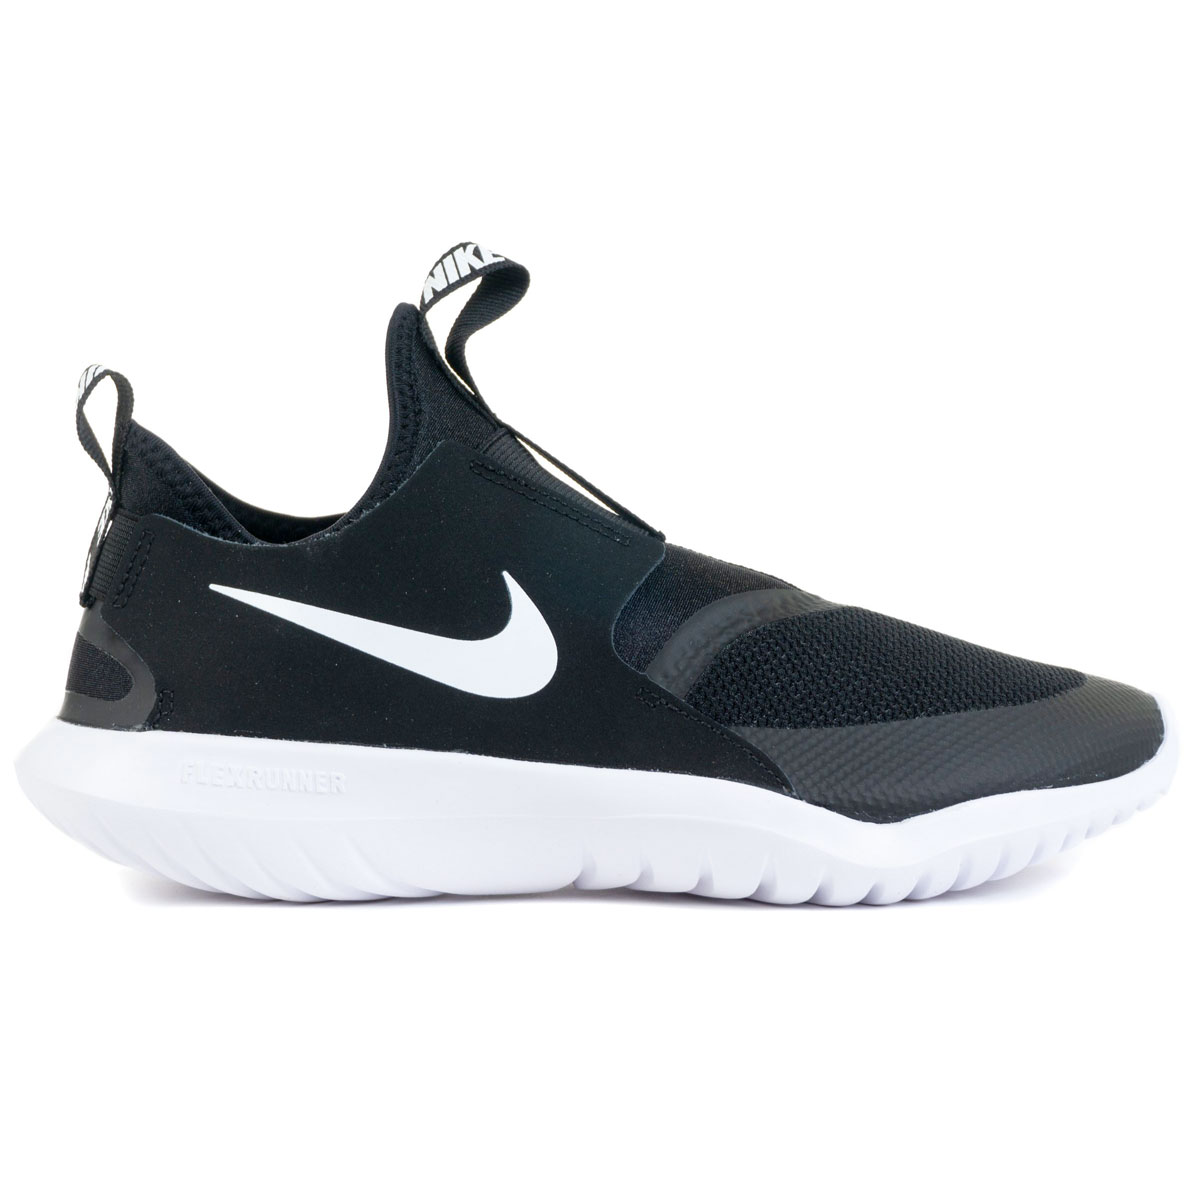 Boys' Flex Running Shoes, Black/White, swatch